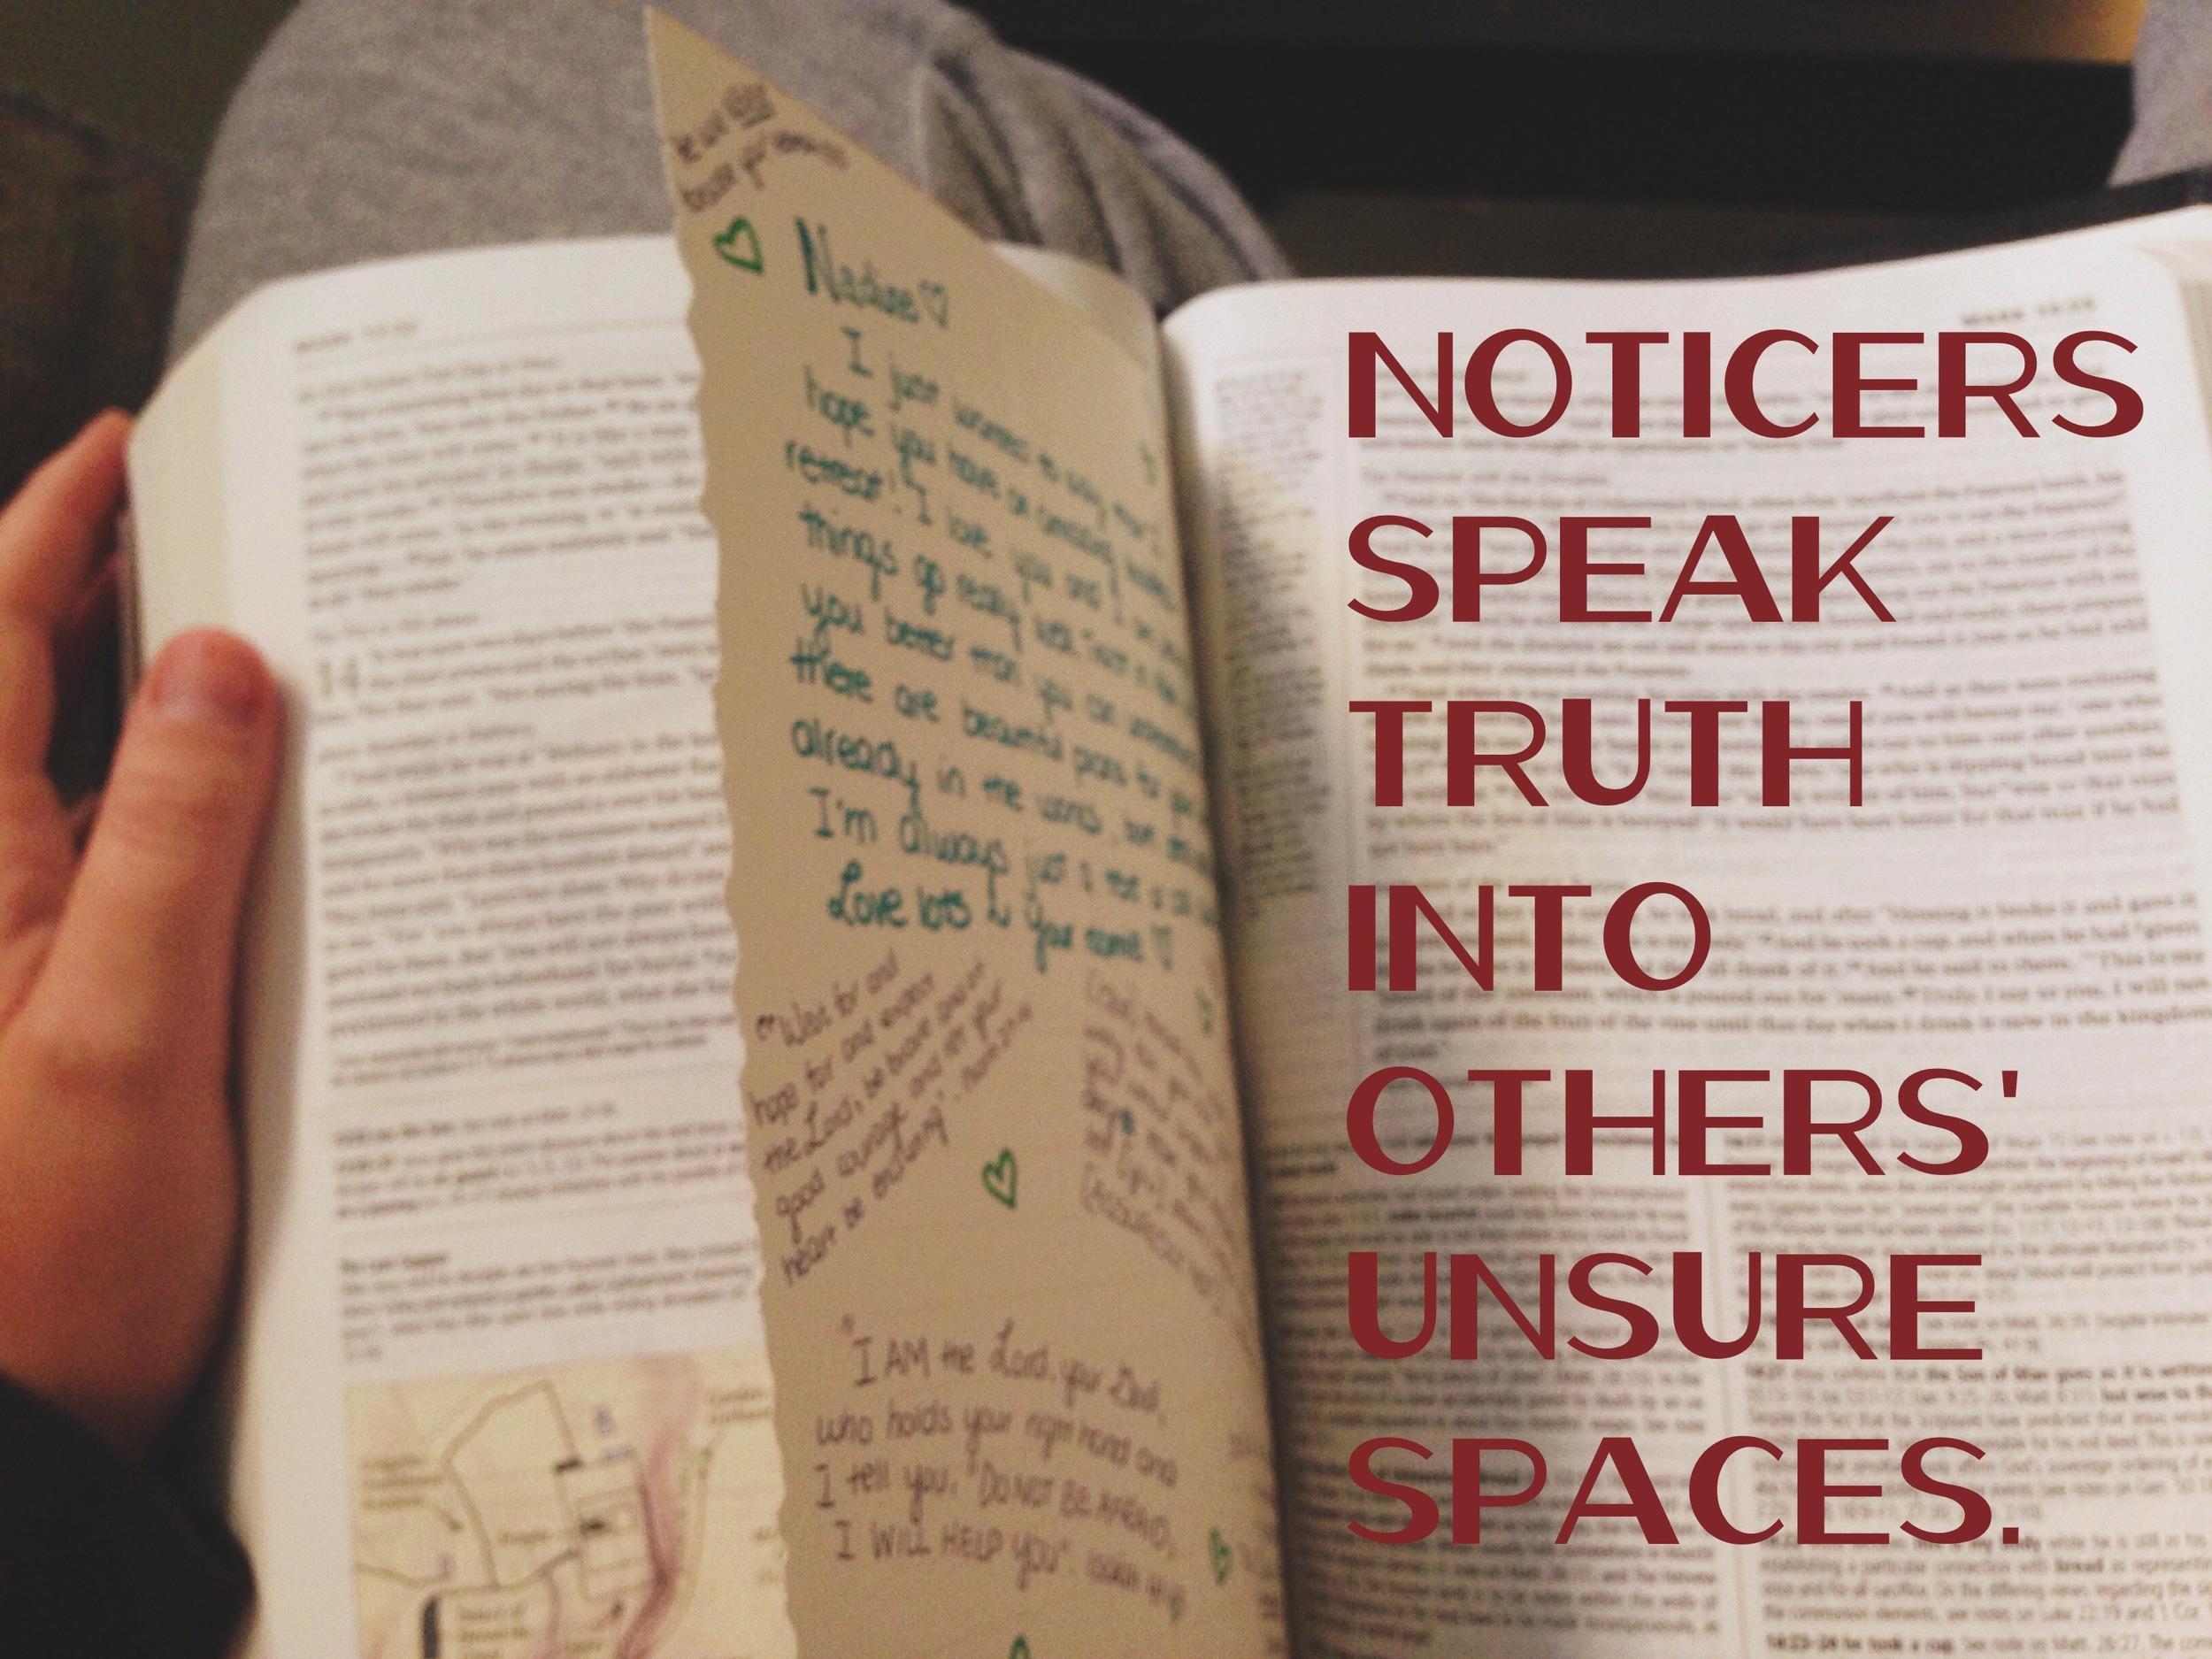 unsure spaces nadinewouldsay noticer